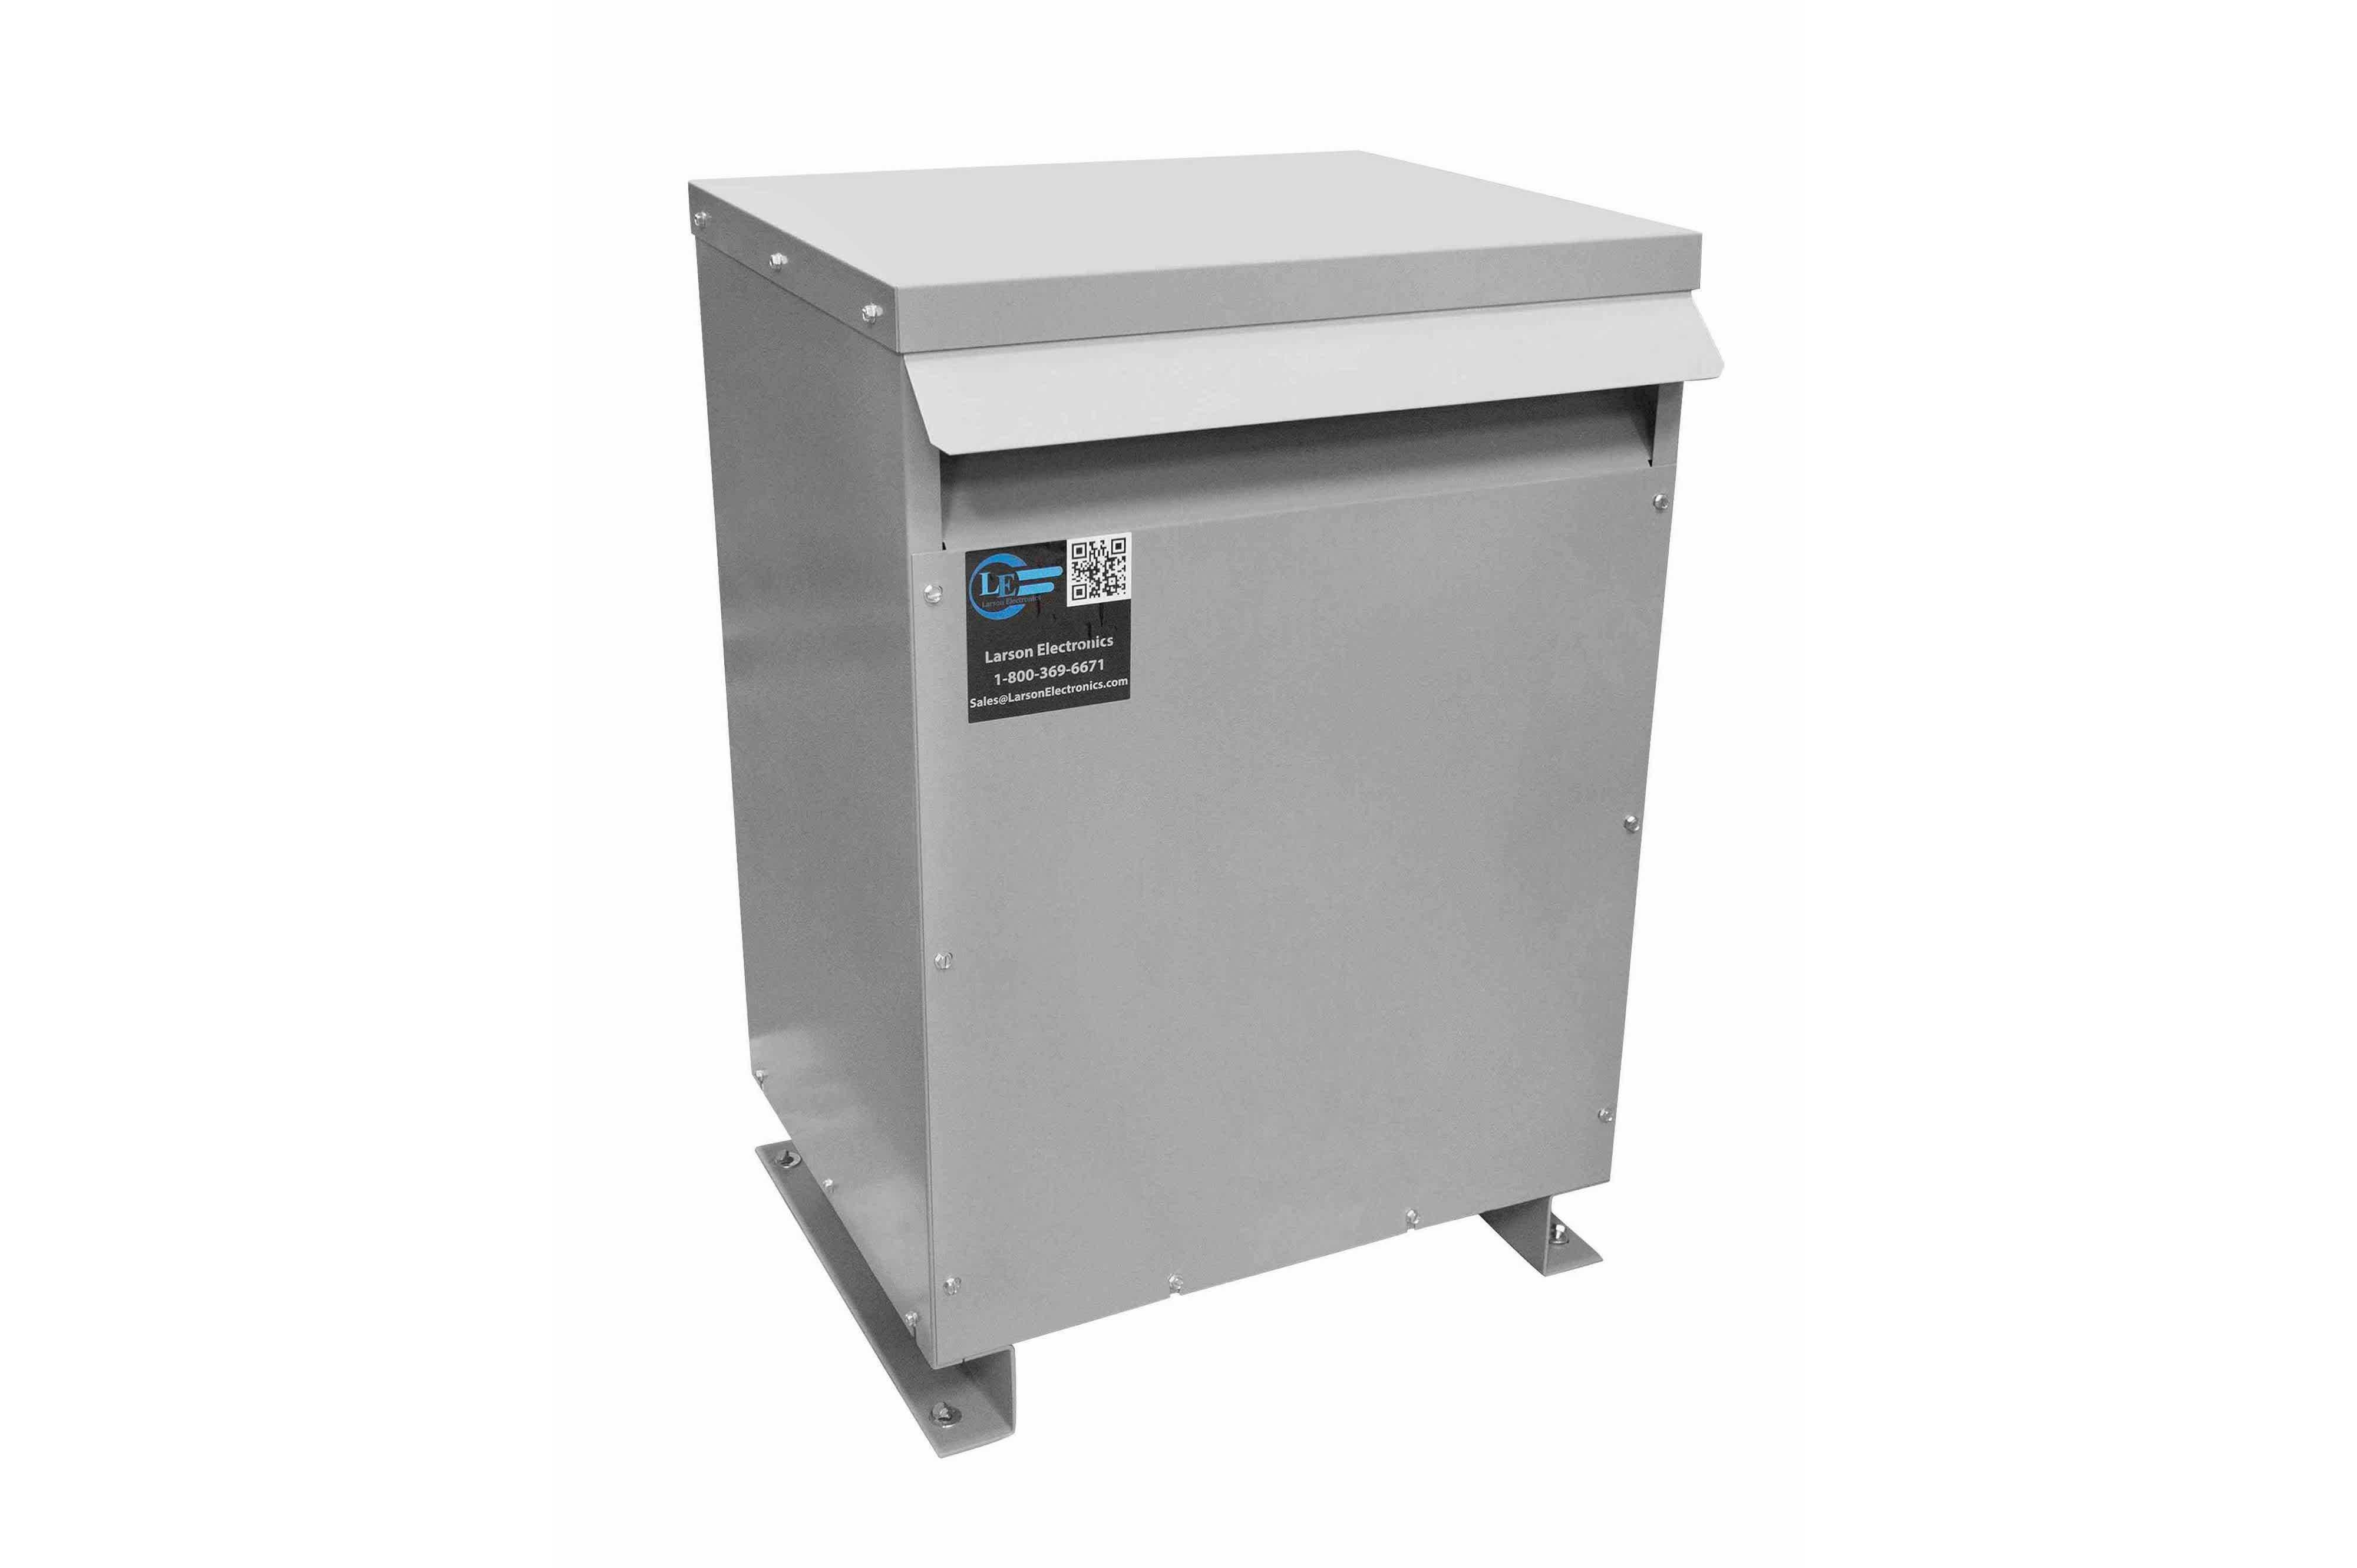 137.5 kVA 3PH Isolation Transformer, 208V Wye Primary, 600V Delta Secondary, N3R, Ventilated, 60 Hz